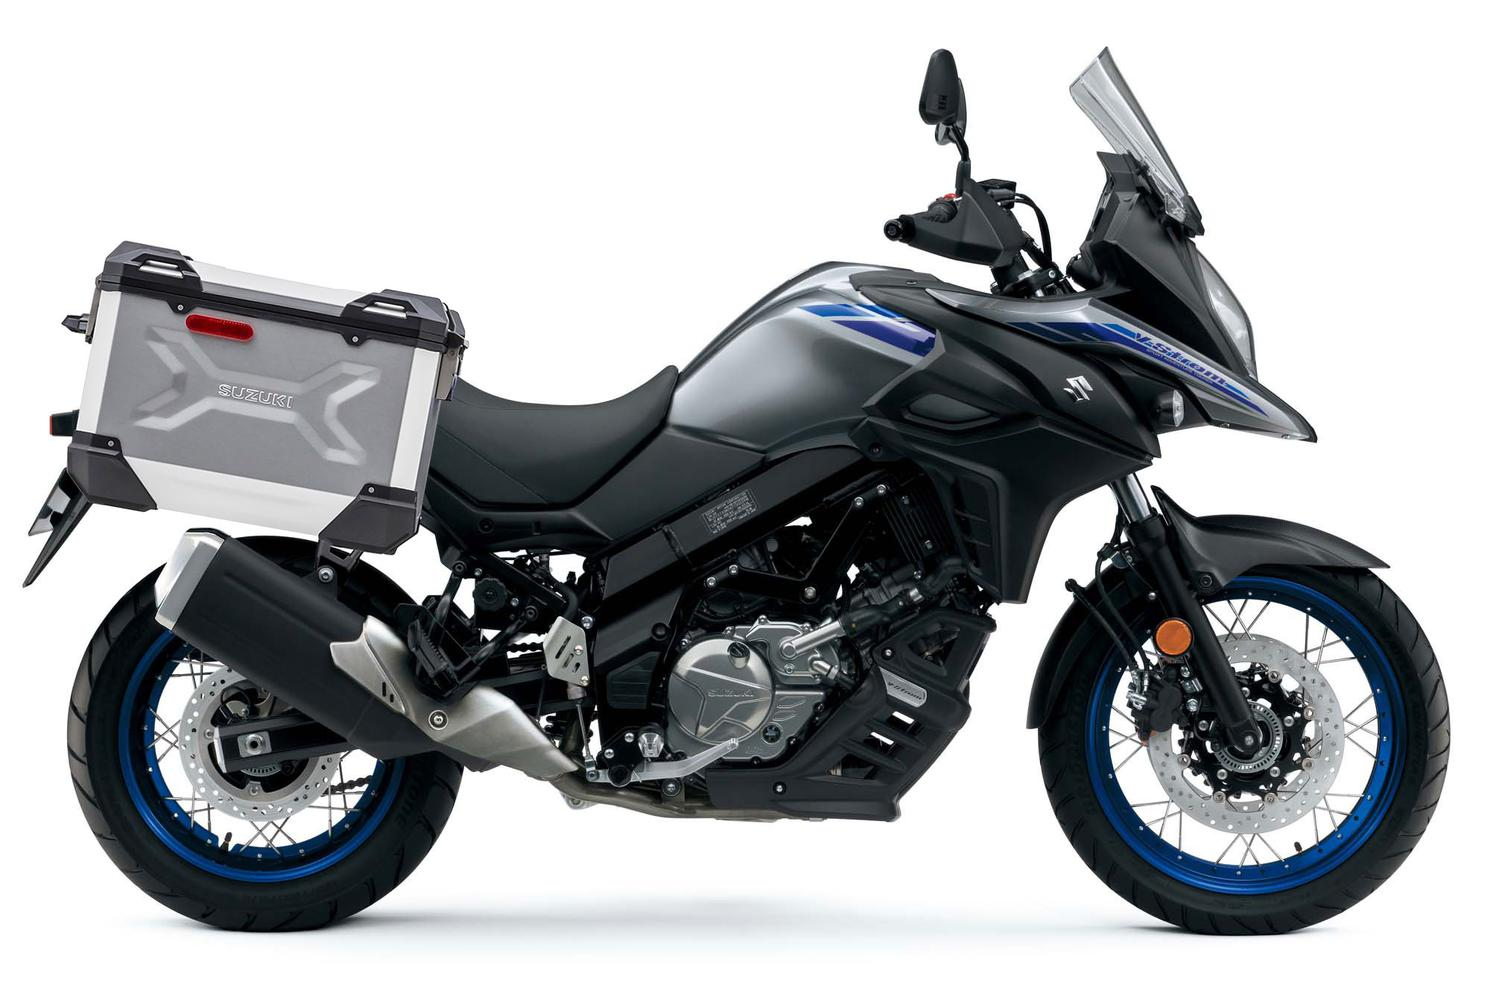 Suzuki V-Strom 650 XA aventure 2021